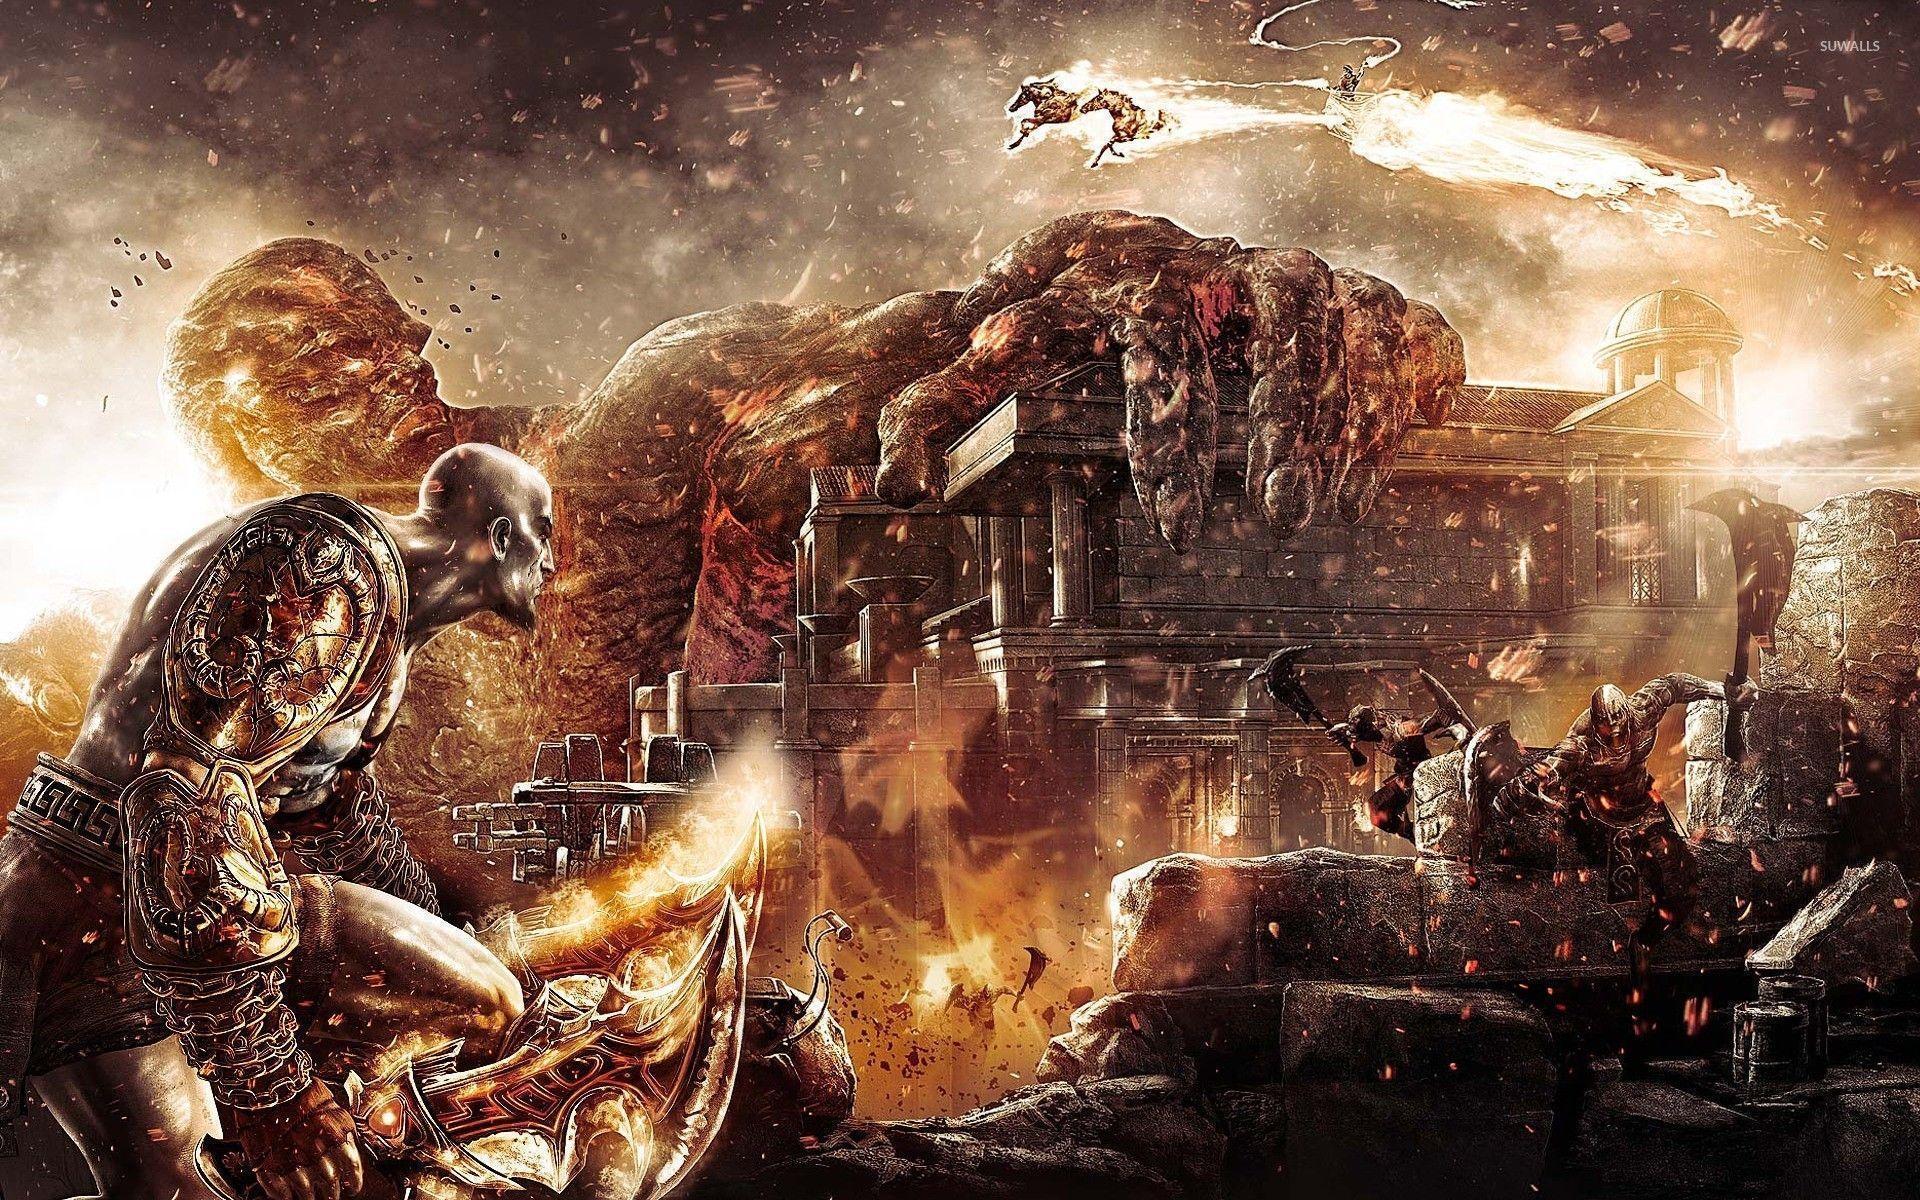 God Of War II Wallpapers - Wallpaper Cave